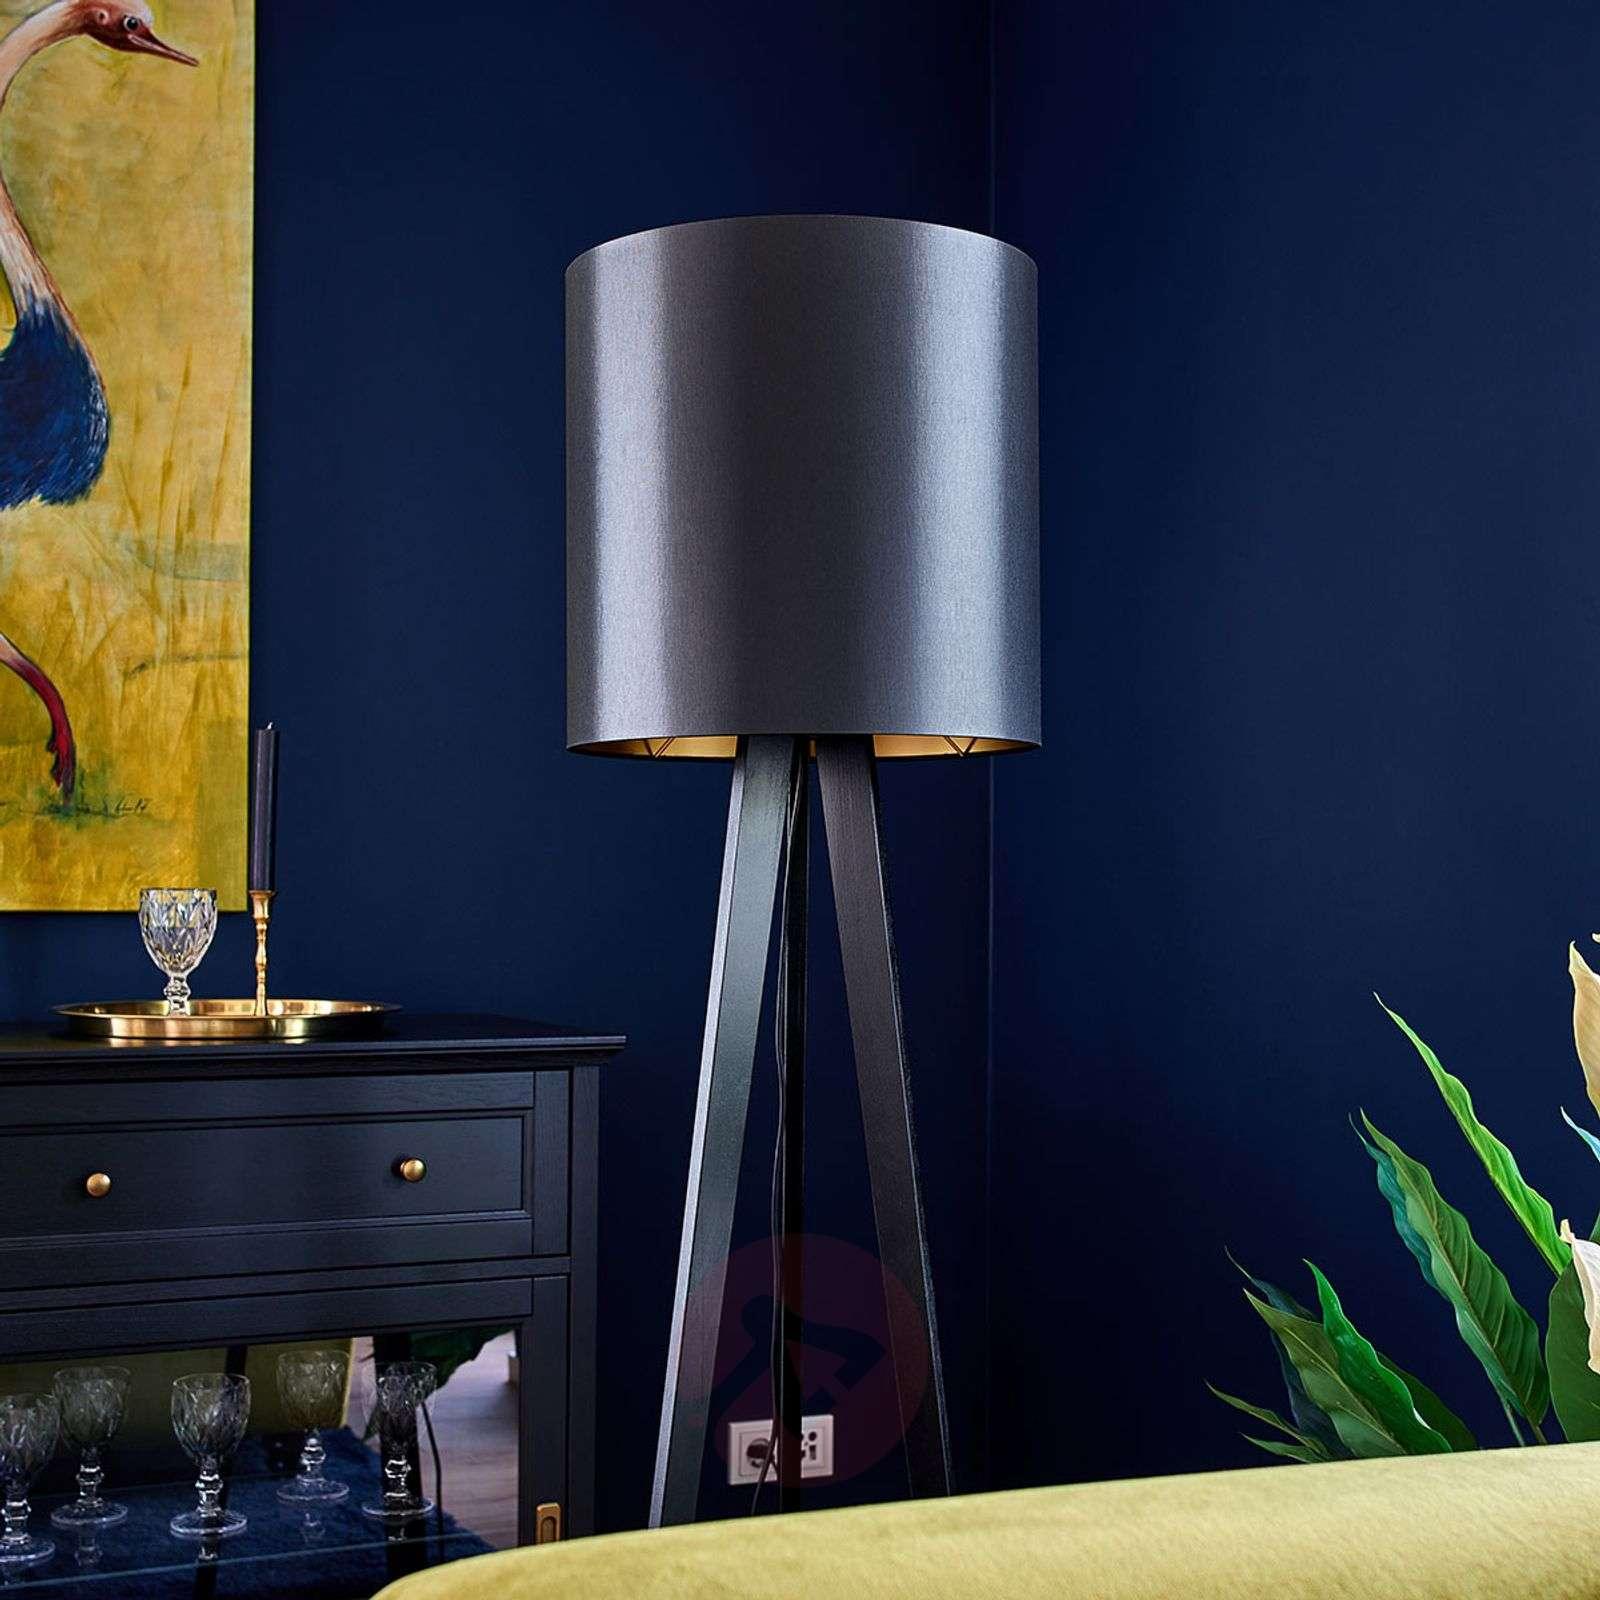 Wooden floor lamp Nida, black-gold lampshade-6722442-01